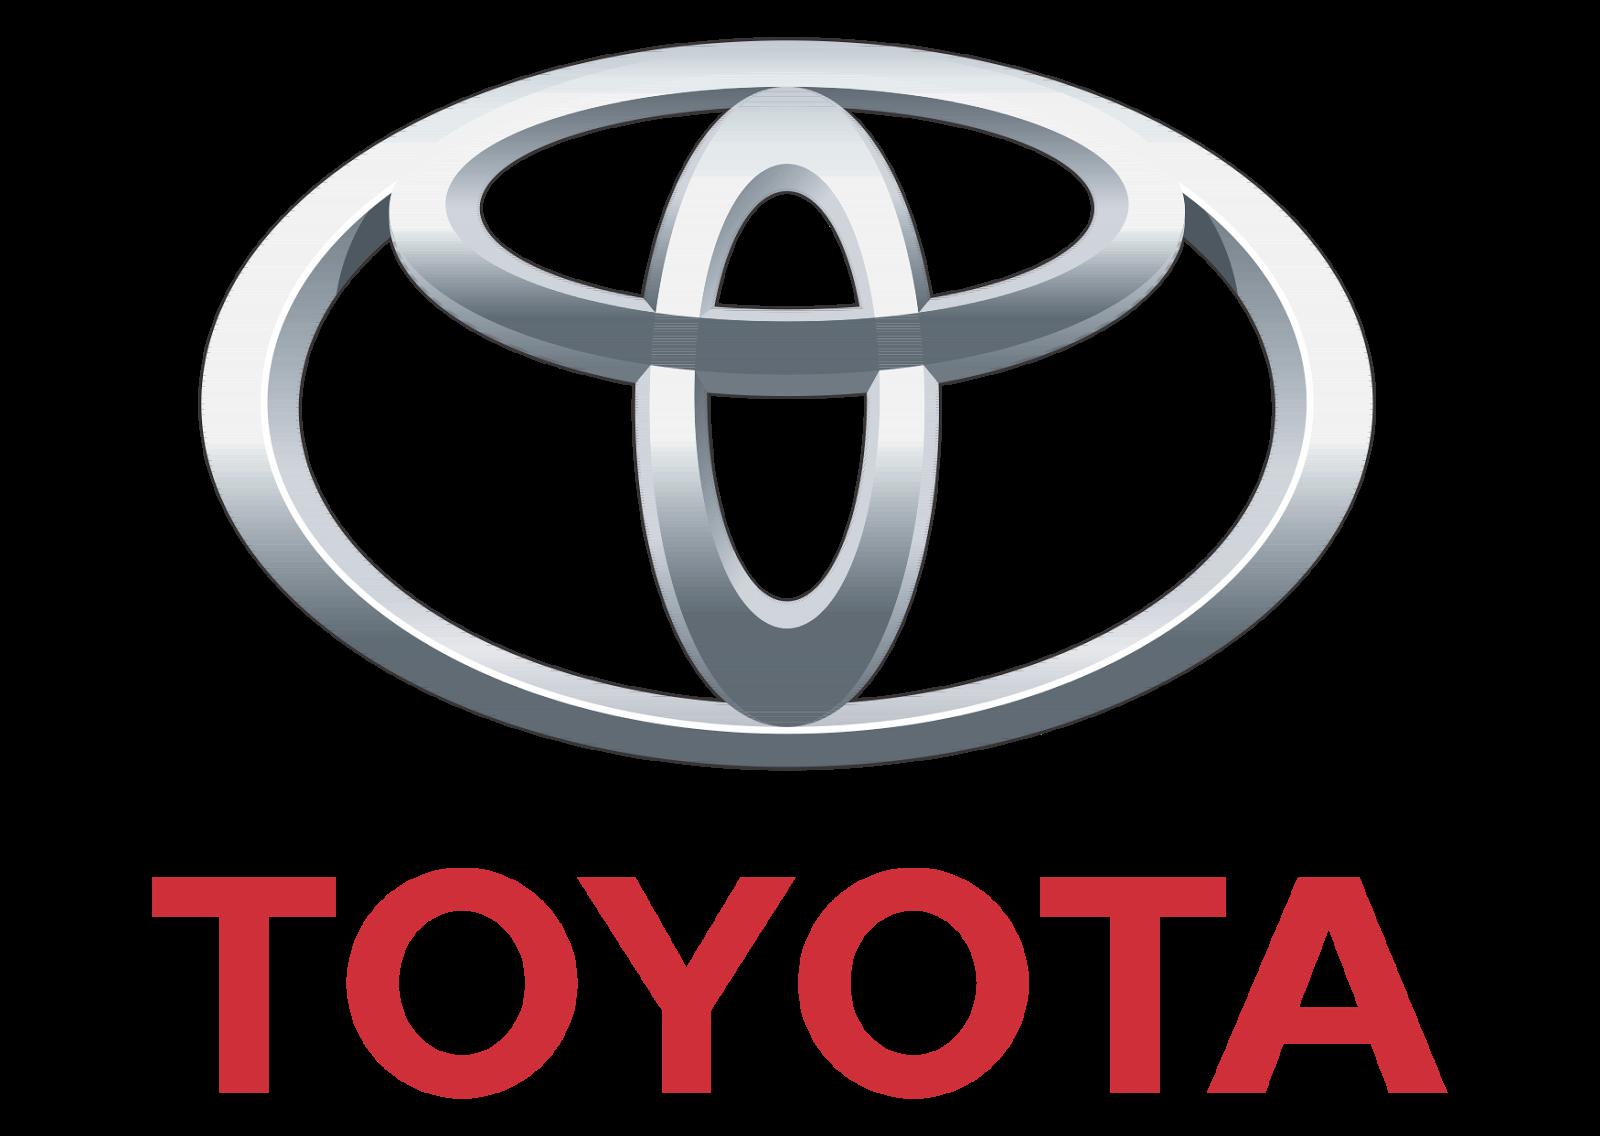 Logo Toyota Flat Png - Toyota Logo Free Download Png Png Image, Transparent background PNG HD thumbnail